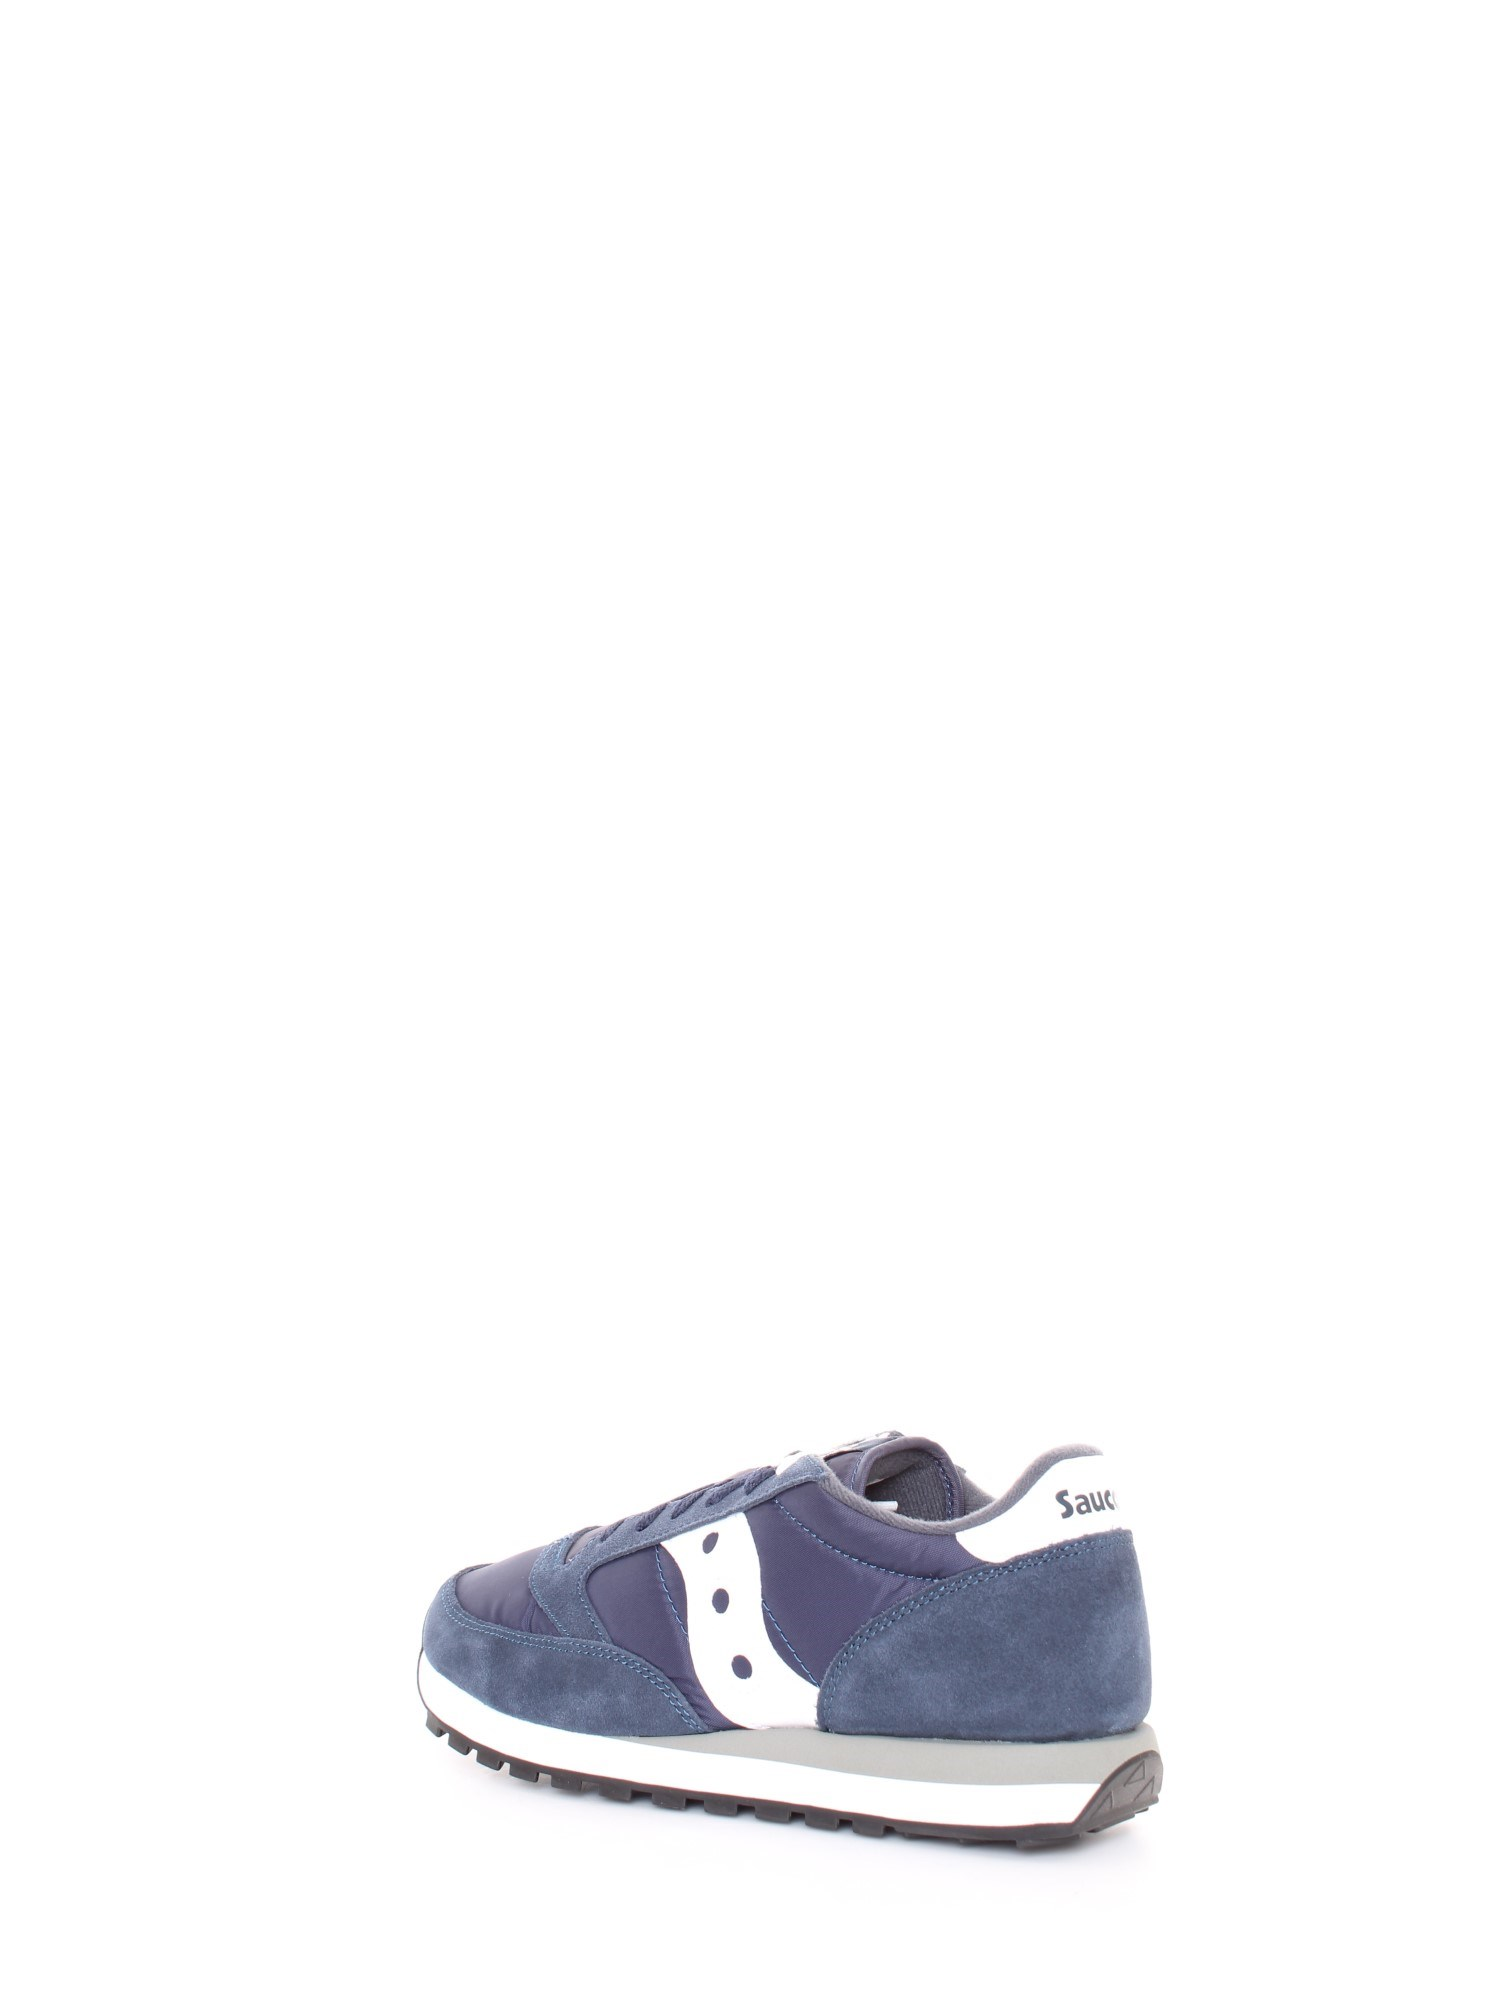 SAUCONY Uomo 2044 Blu bianco 316 Sneakers PrimaveraEstate